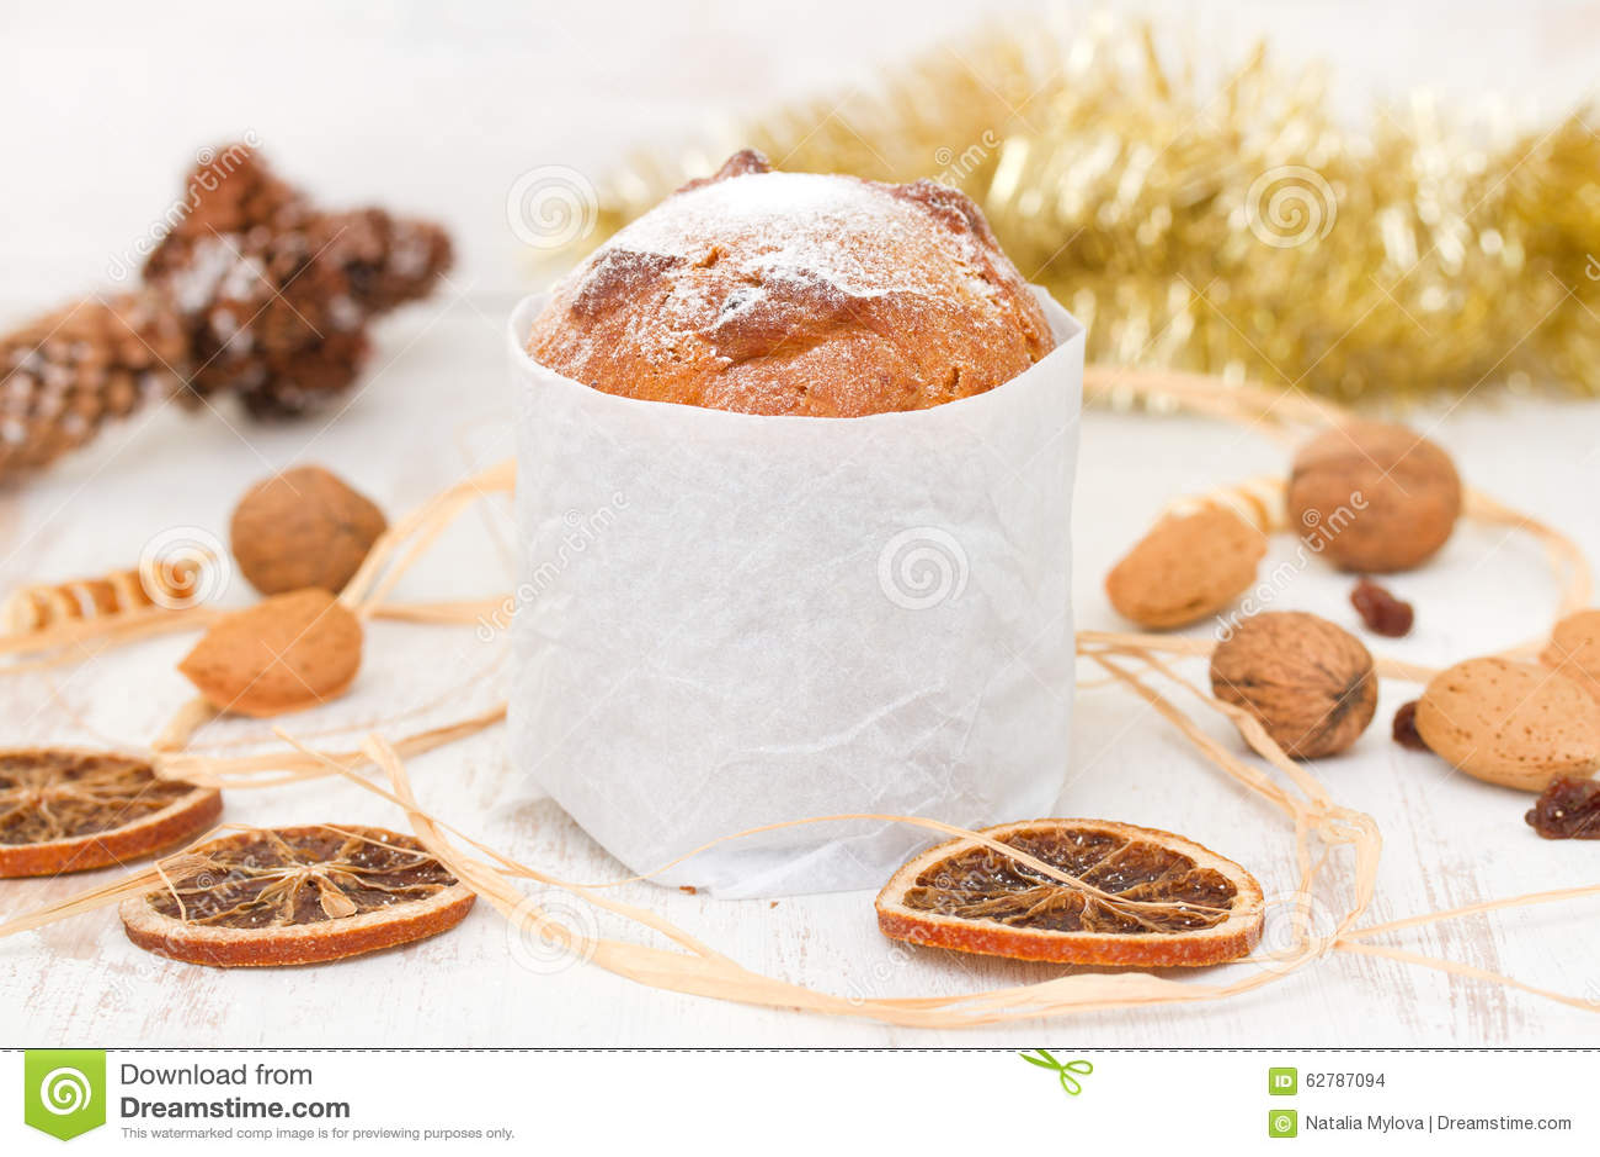 Italian Christmas dessert stock photo. Image of december - 62787094